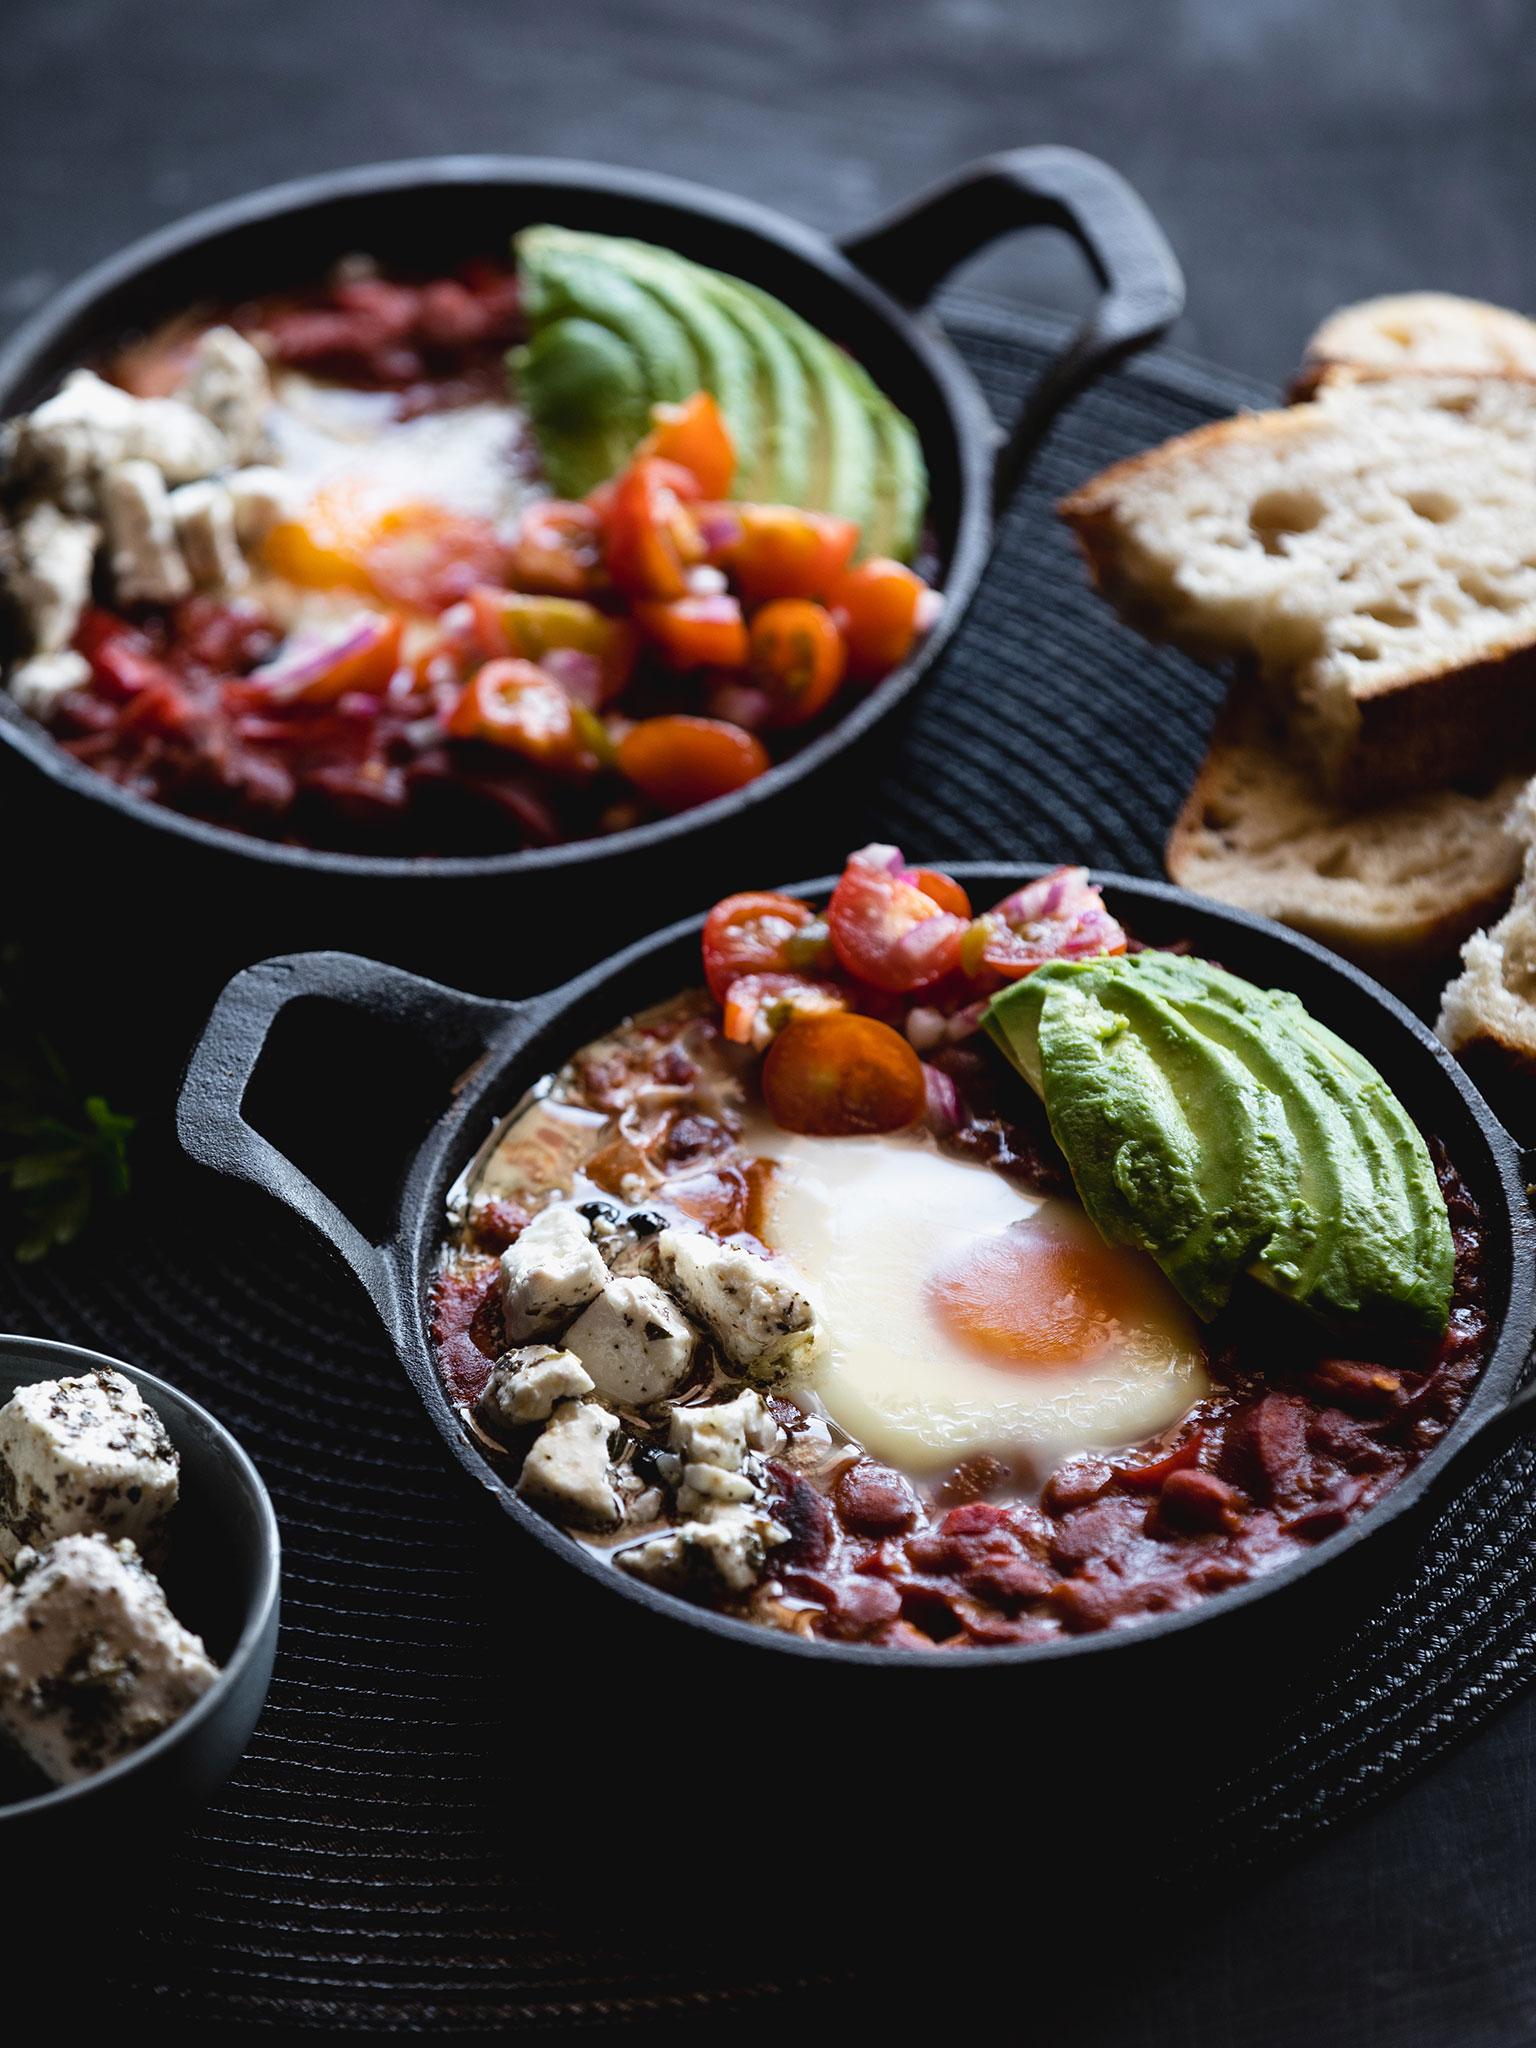 2-130-Baked-Eggs-with-Chorizo-and-Mexe-Beans-web.jpg